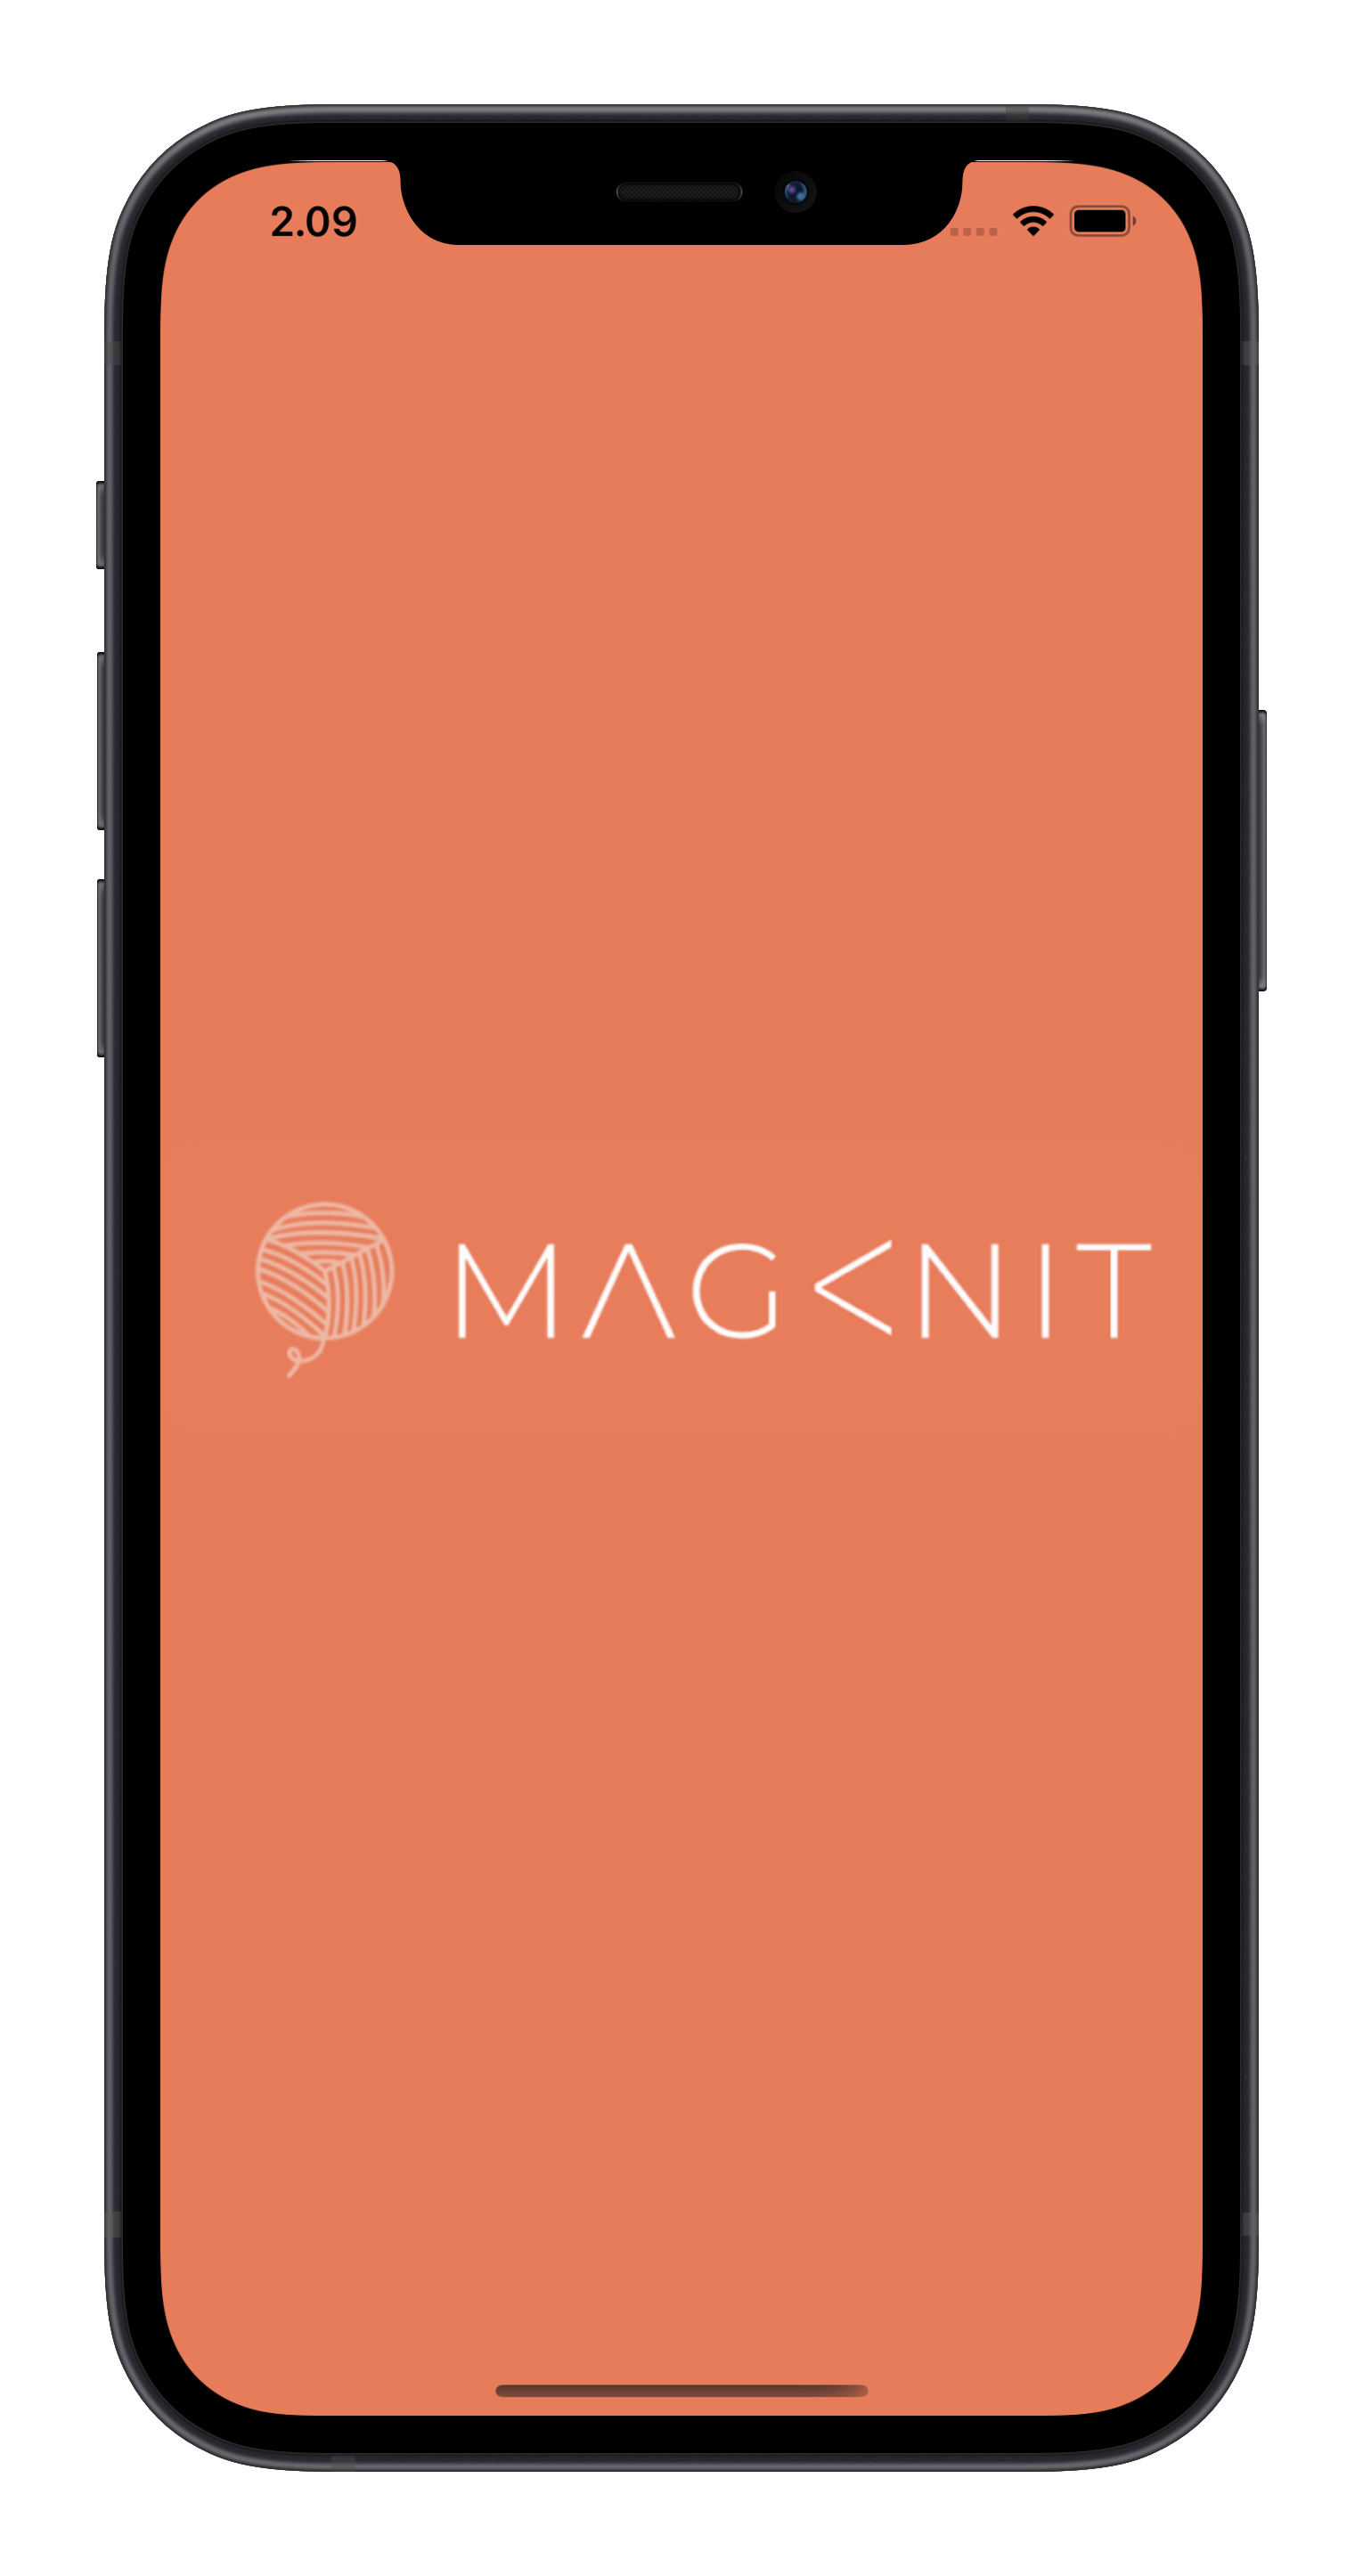 https://magknit.dk/wp-content/uploads/2021/04/Simulator-Screen-Shot-iPhone-12-Pro-Max-2021-04-13-at-14.09.11_iphone12black_portrait.png